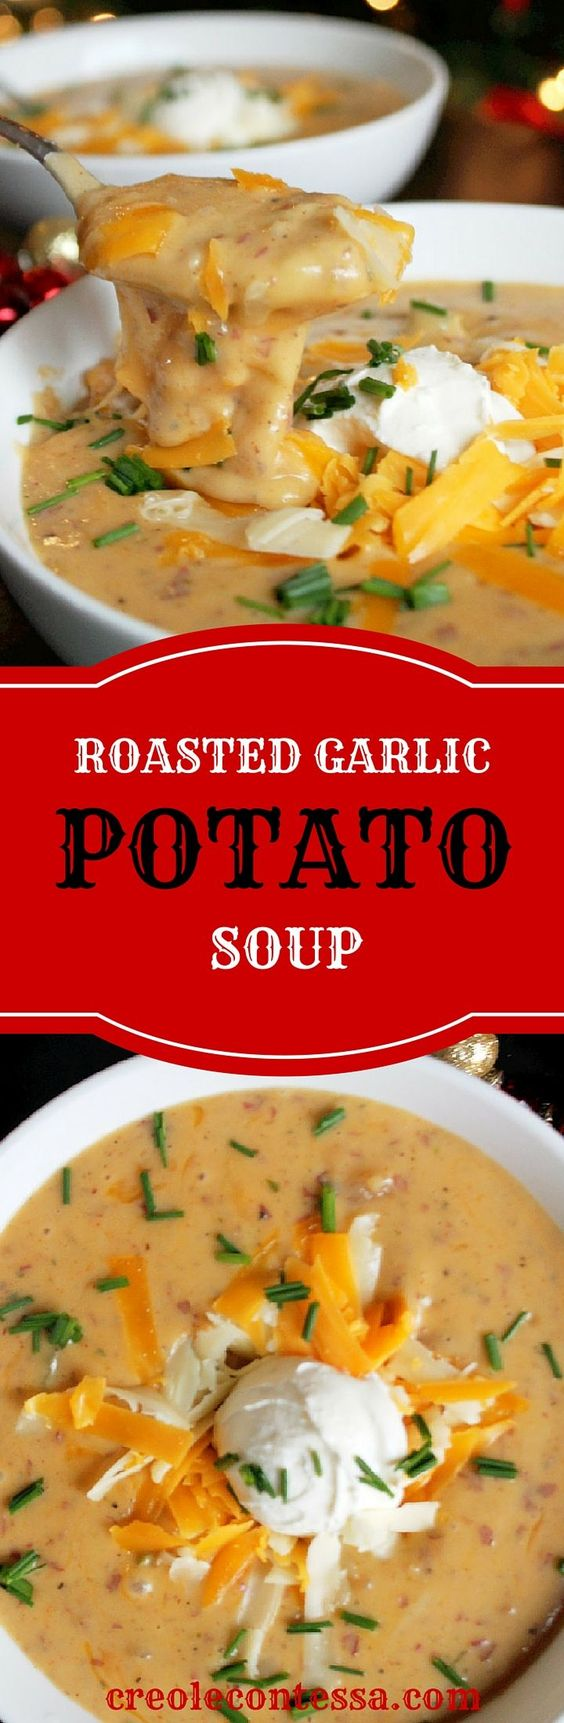 ... roasted garlic baked potato soup potato soup baked potatoes garlic